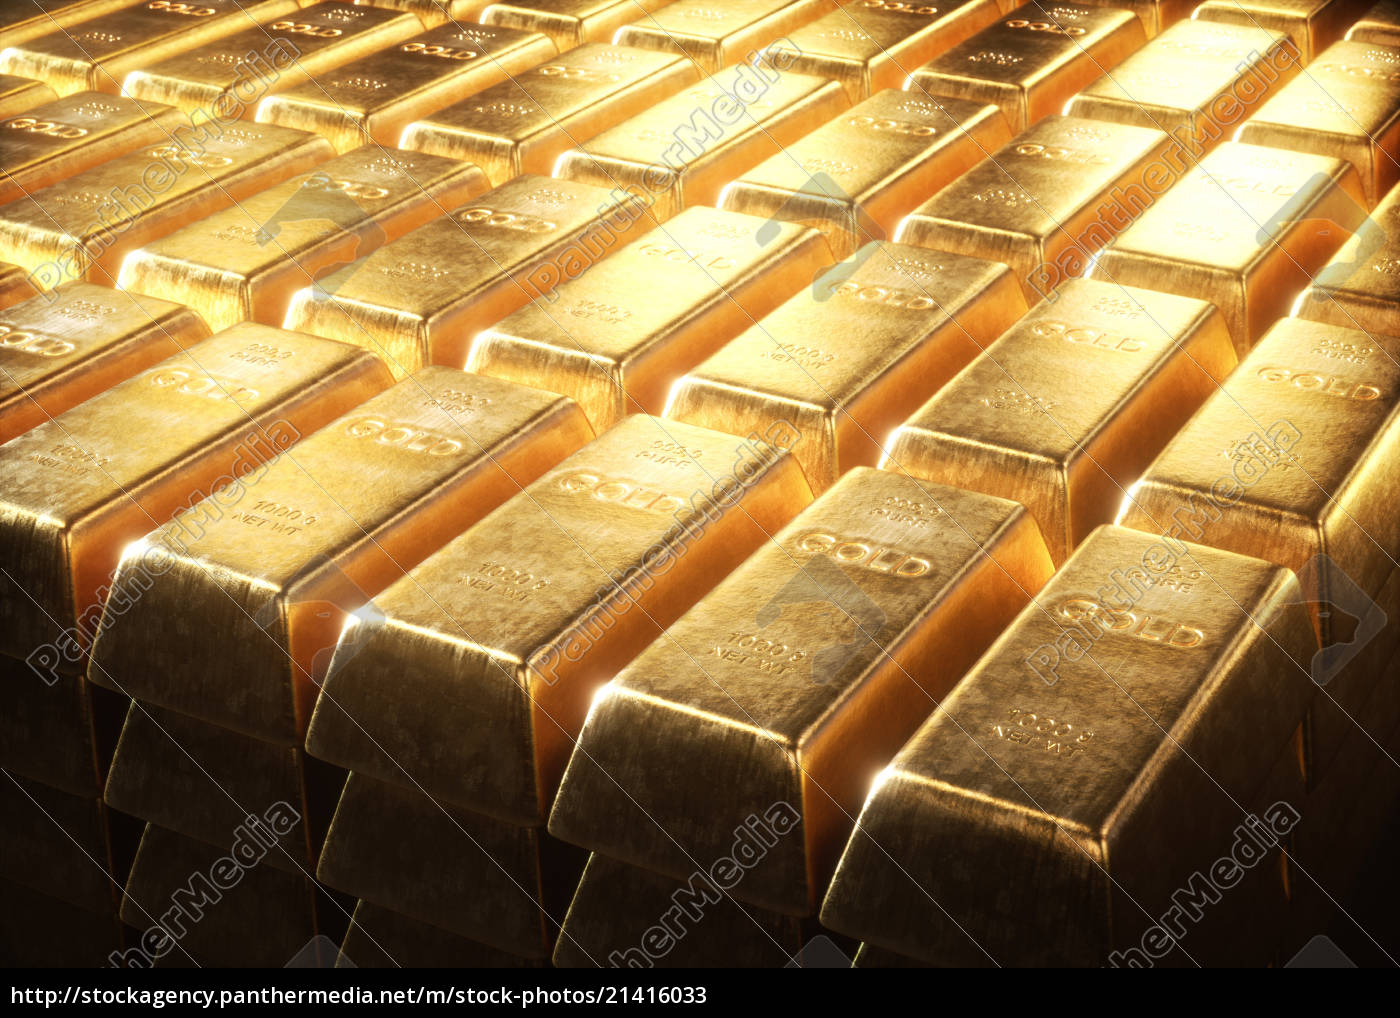 1000 Gram Gold Bars Stock Photo 21416033 Panthermedia Stock Agency